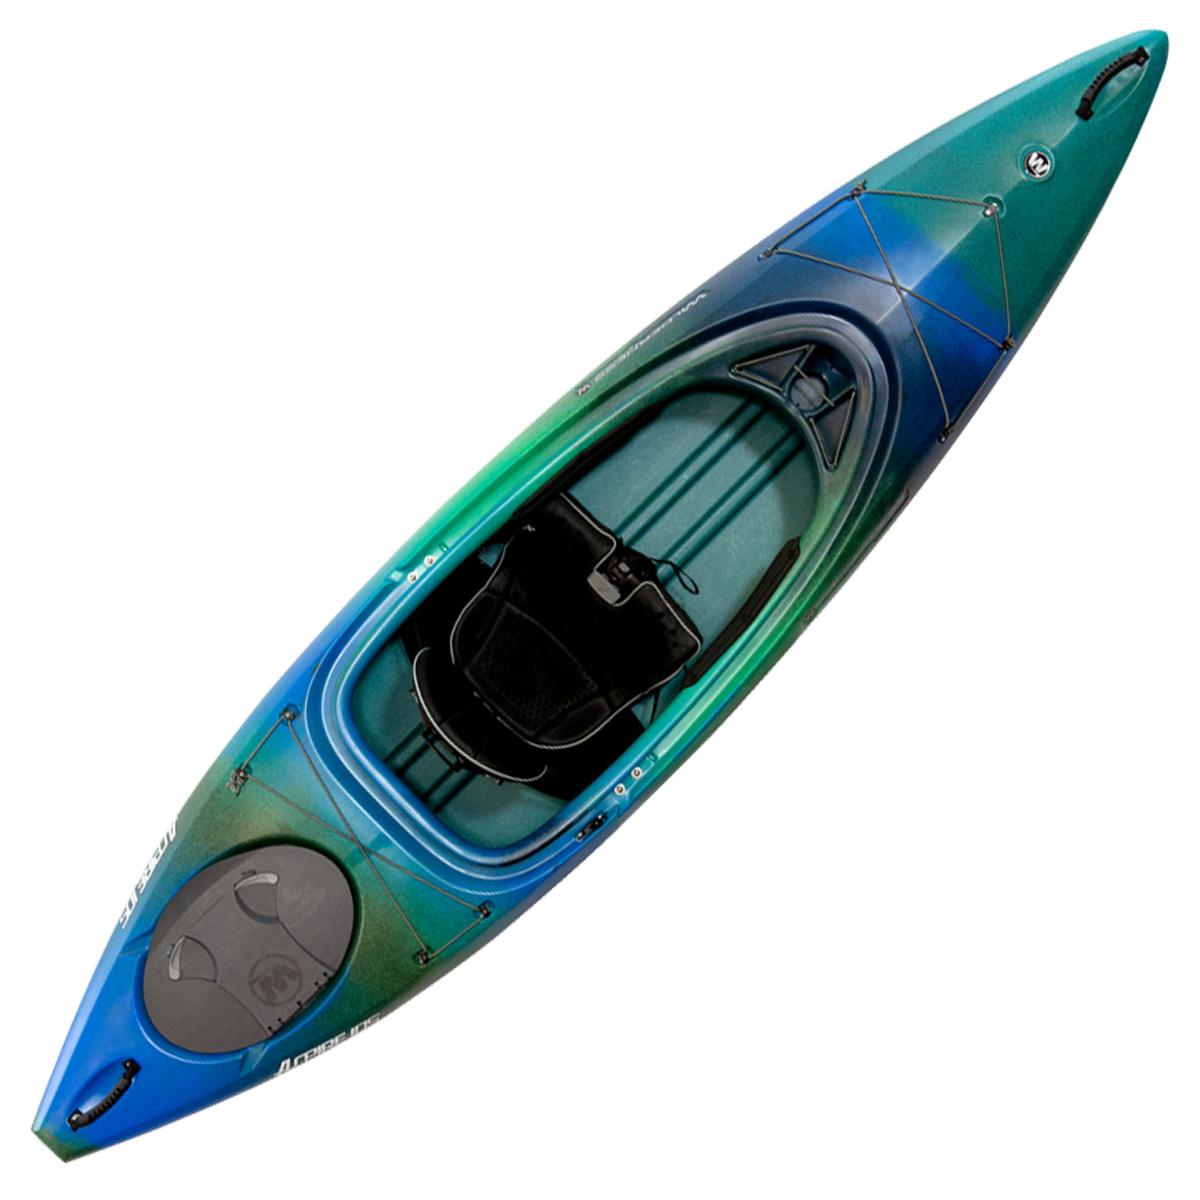 Wilderness Systems Aspire 105 Recreational Kayak Galaxy